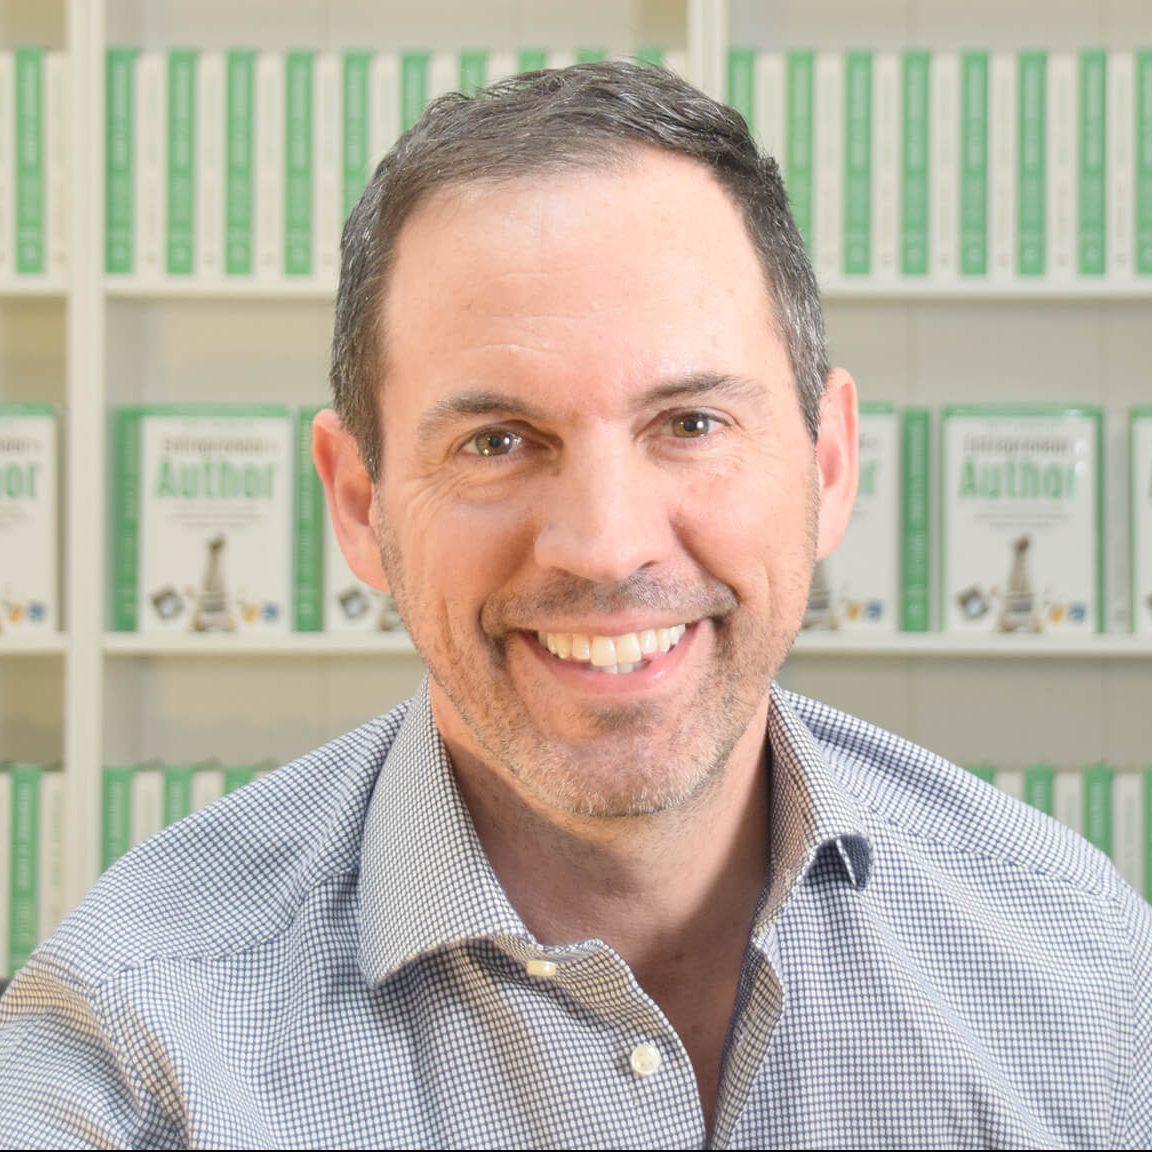 Entrepreneur to Author Podcast Host Scott A. MacMillan